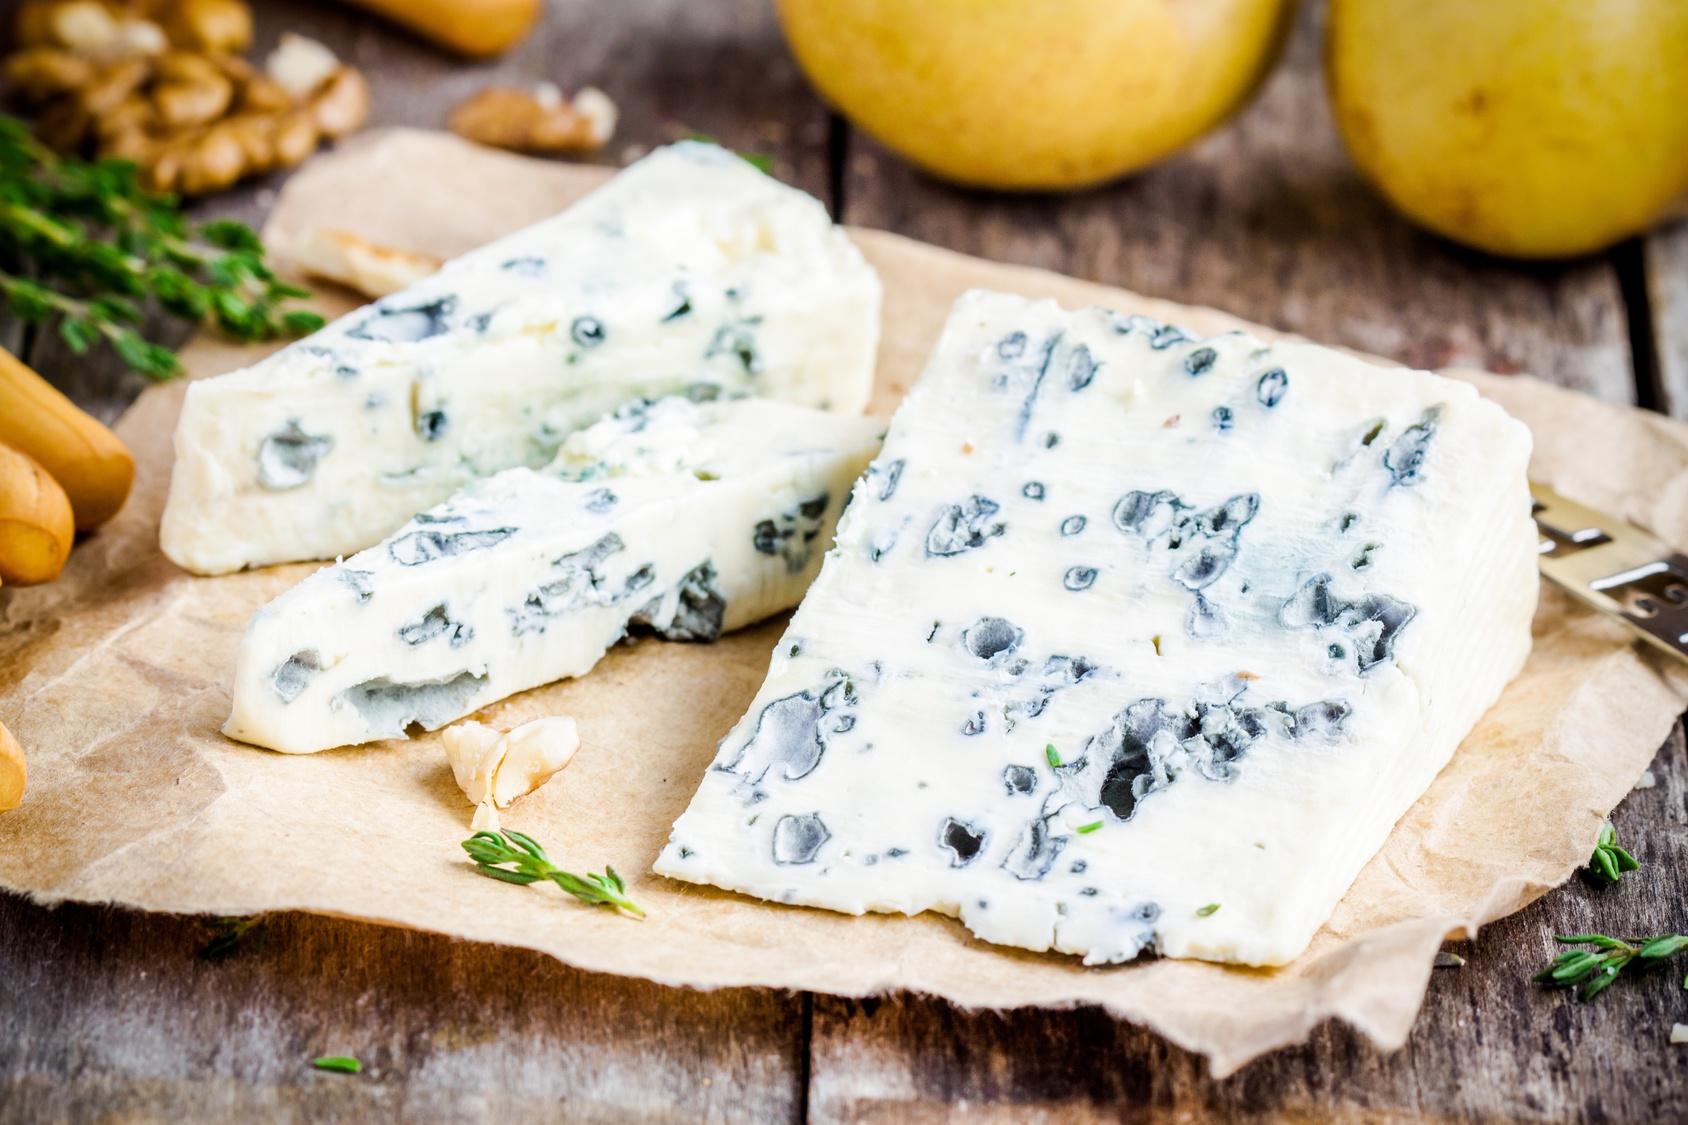 Käse selber machen - Blauschimmelkäse